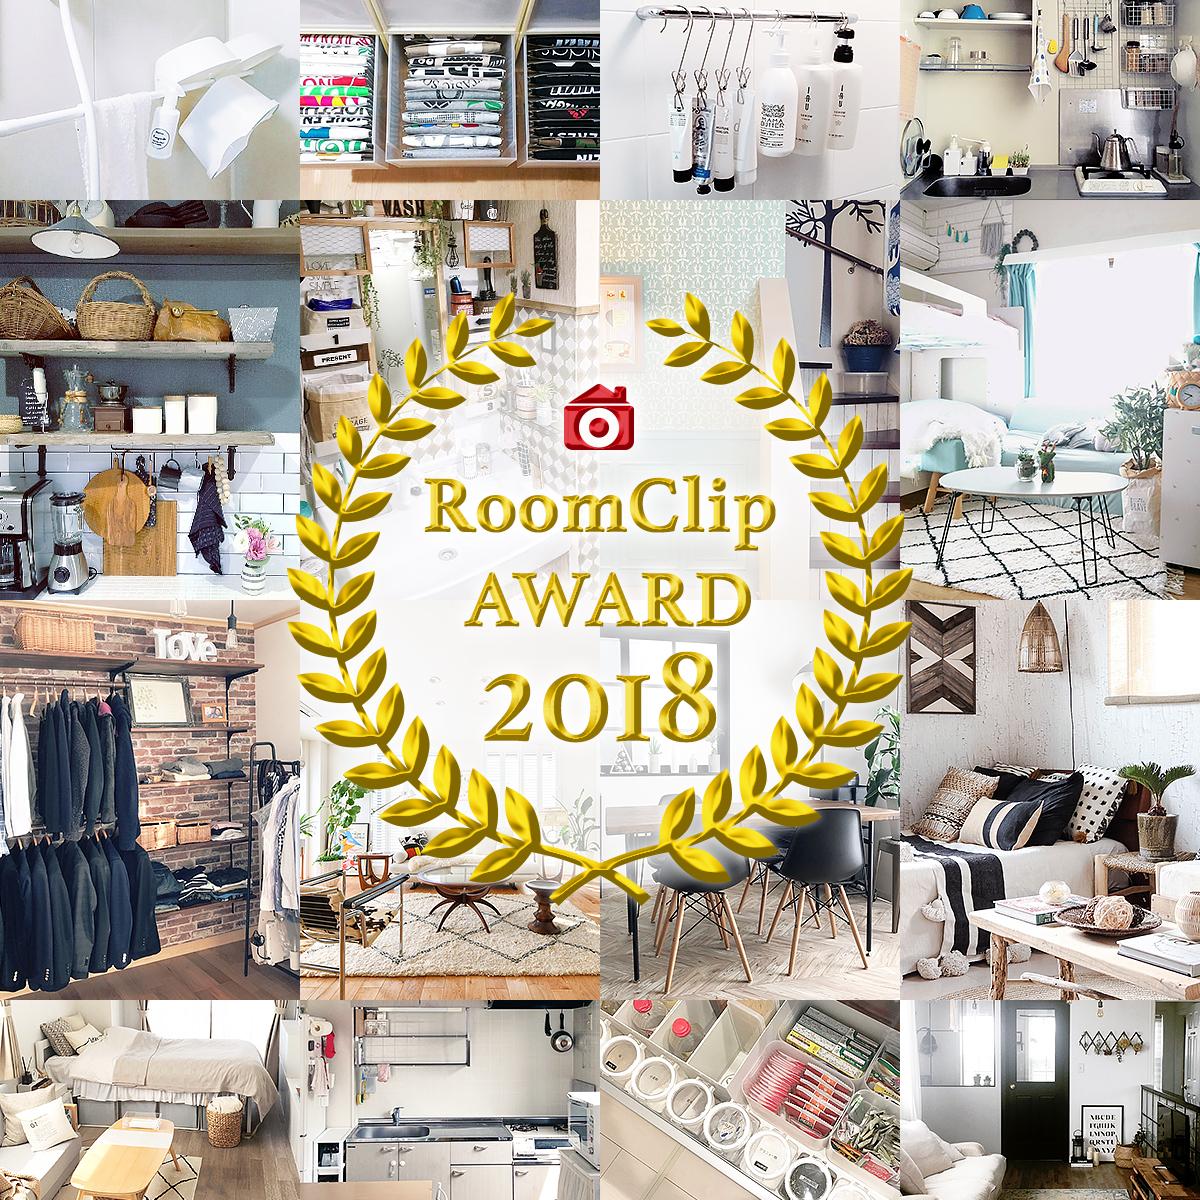 RoomClip Award 2018☆今年のインテリアトレンドを大発表!